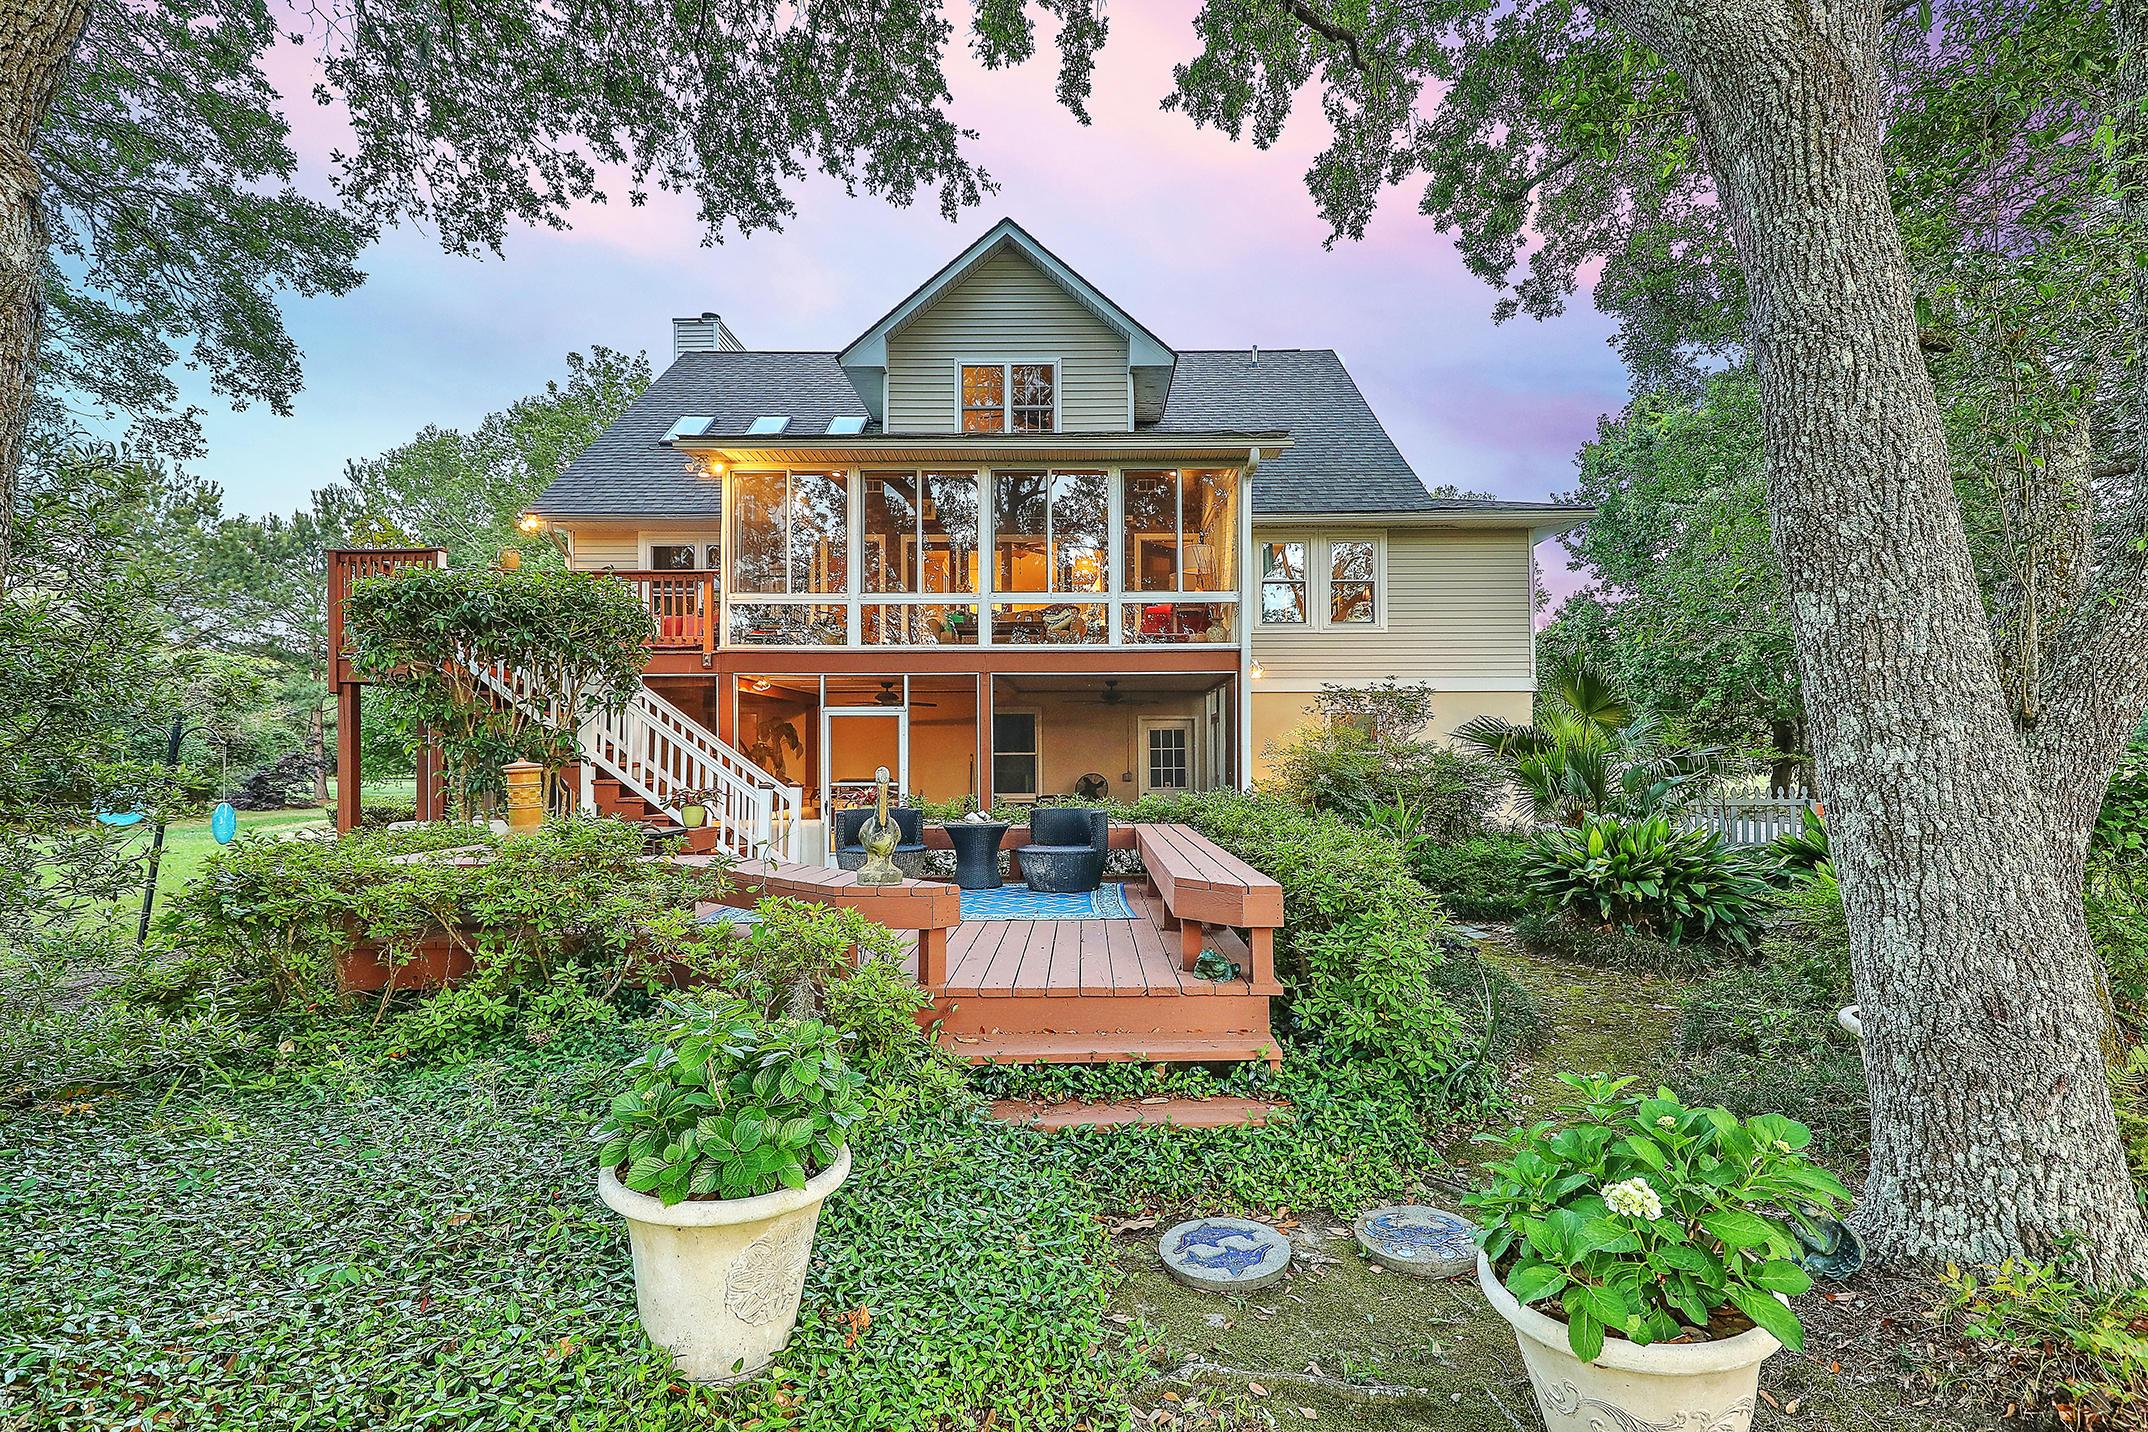 Stono Pointe Homes For Sale - 2660 Burden Creek, Johns Island, SC - 18